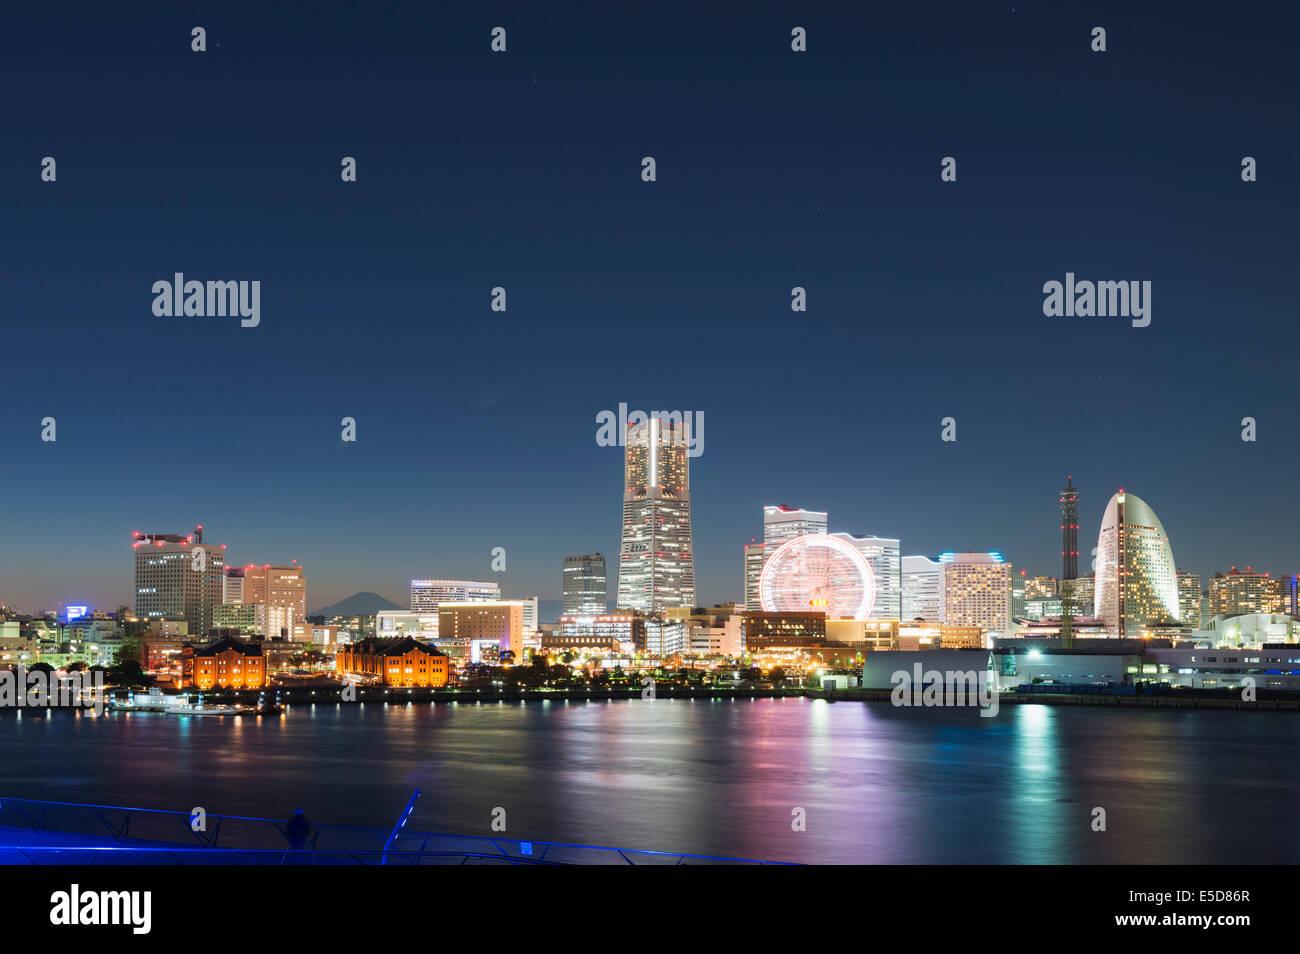 Asia; Japan; Honshu; Yokohama Bay and skyline - Stock Image